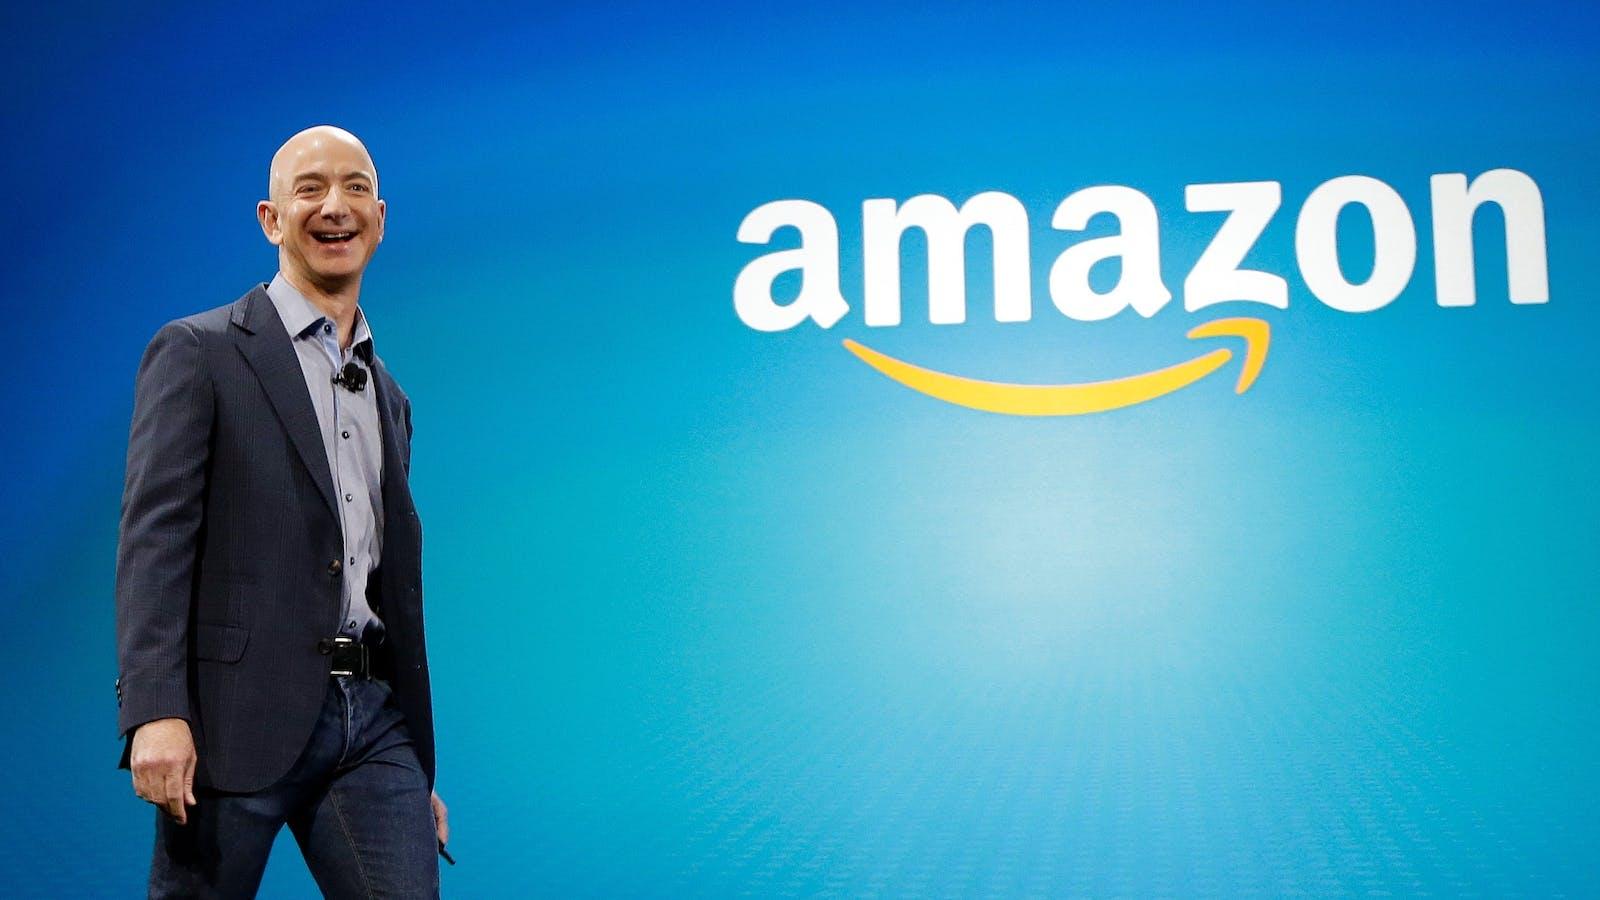 Amazon CEO Jeff Bezos. Photo by AP.